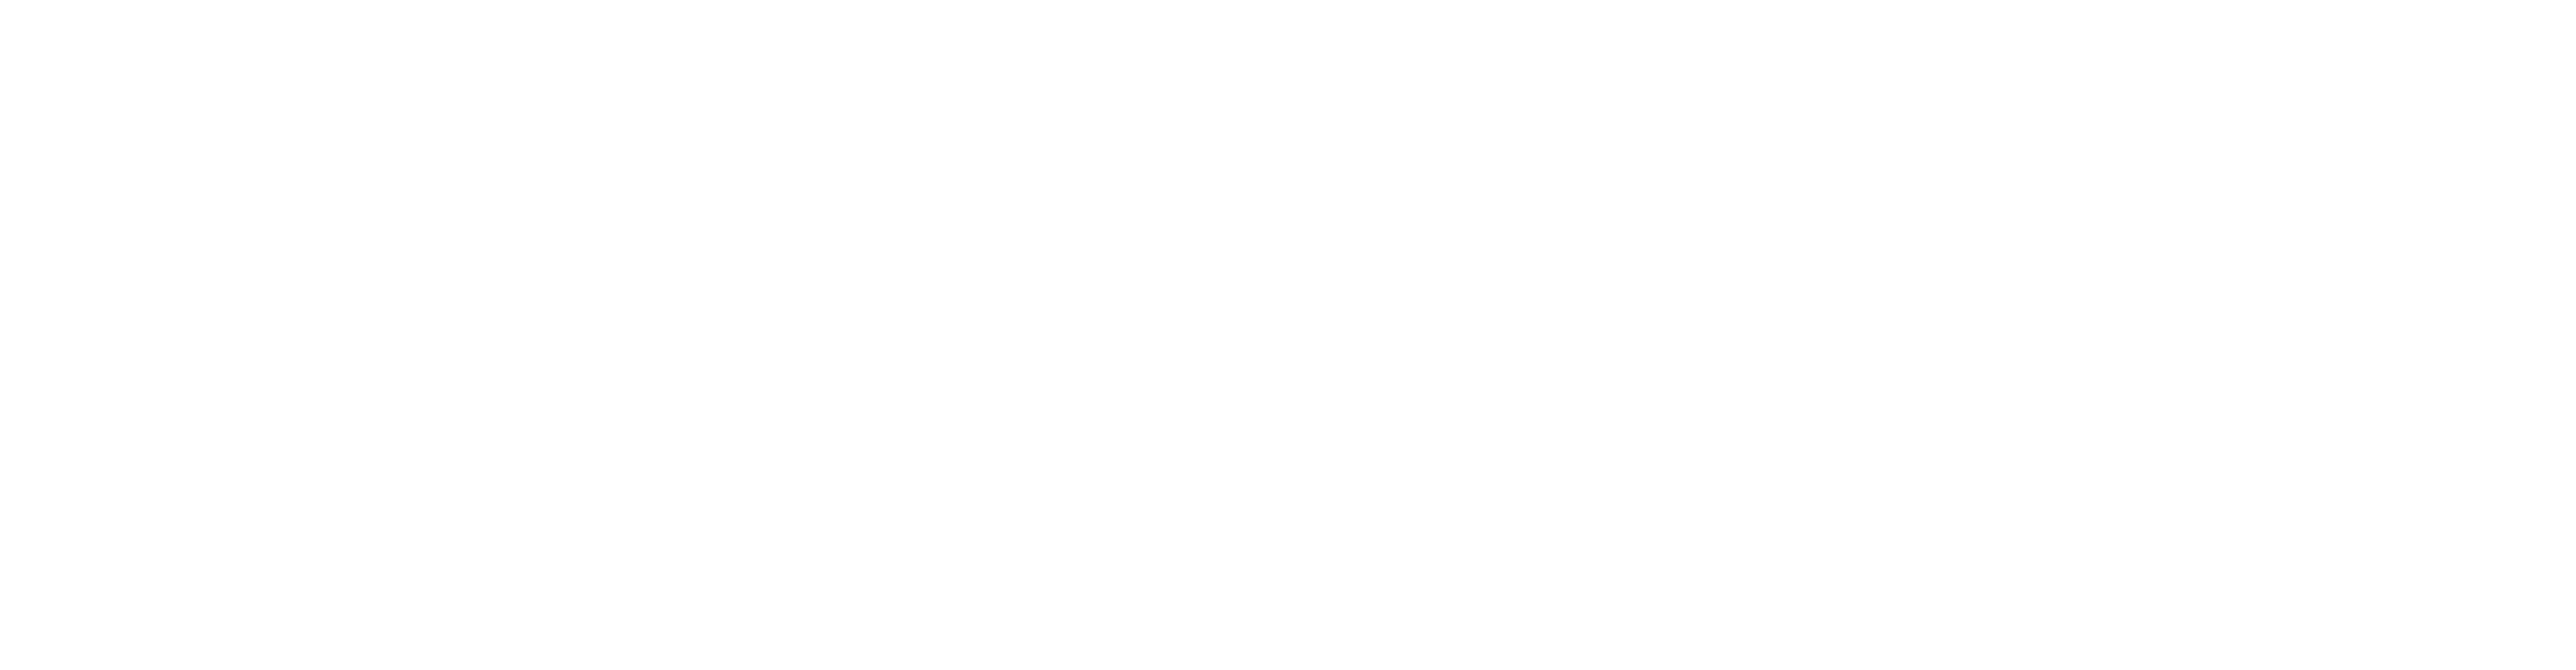 redseal cybersecurity analytics platform network digital